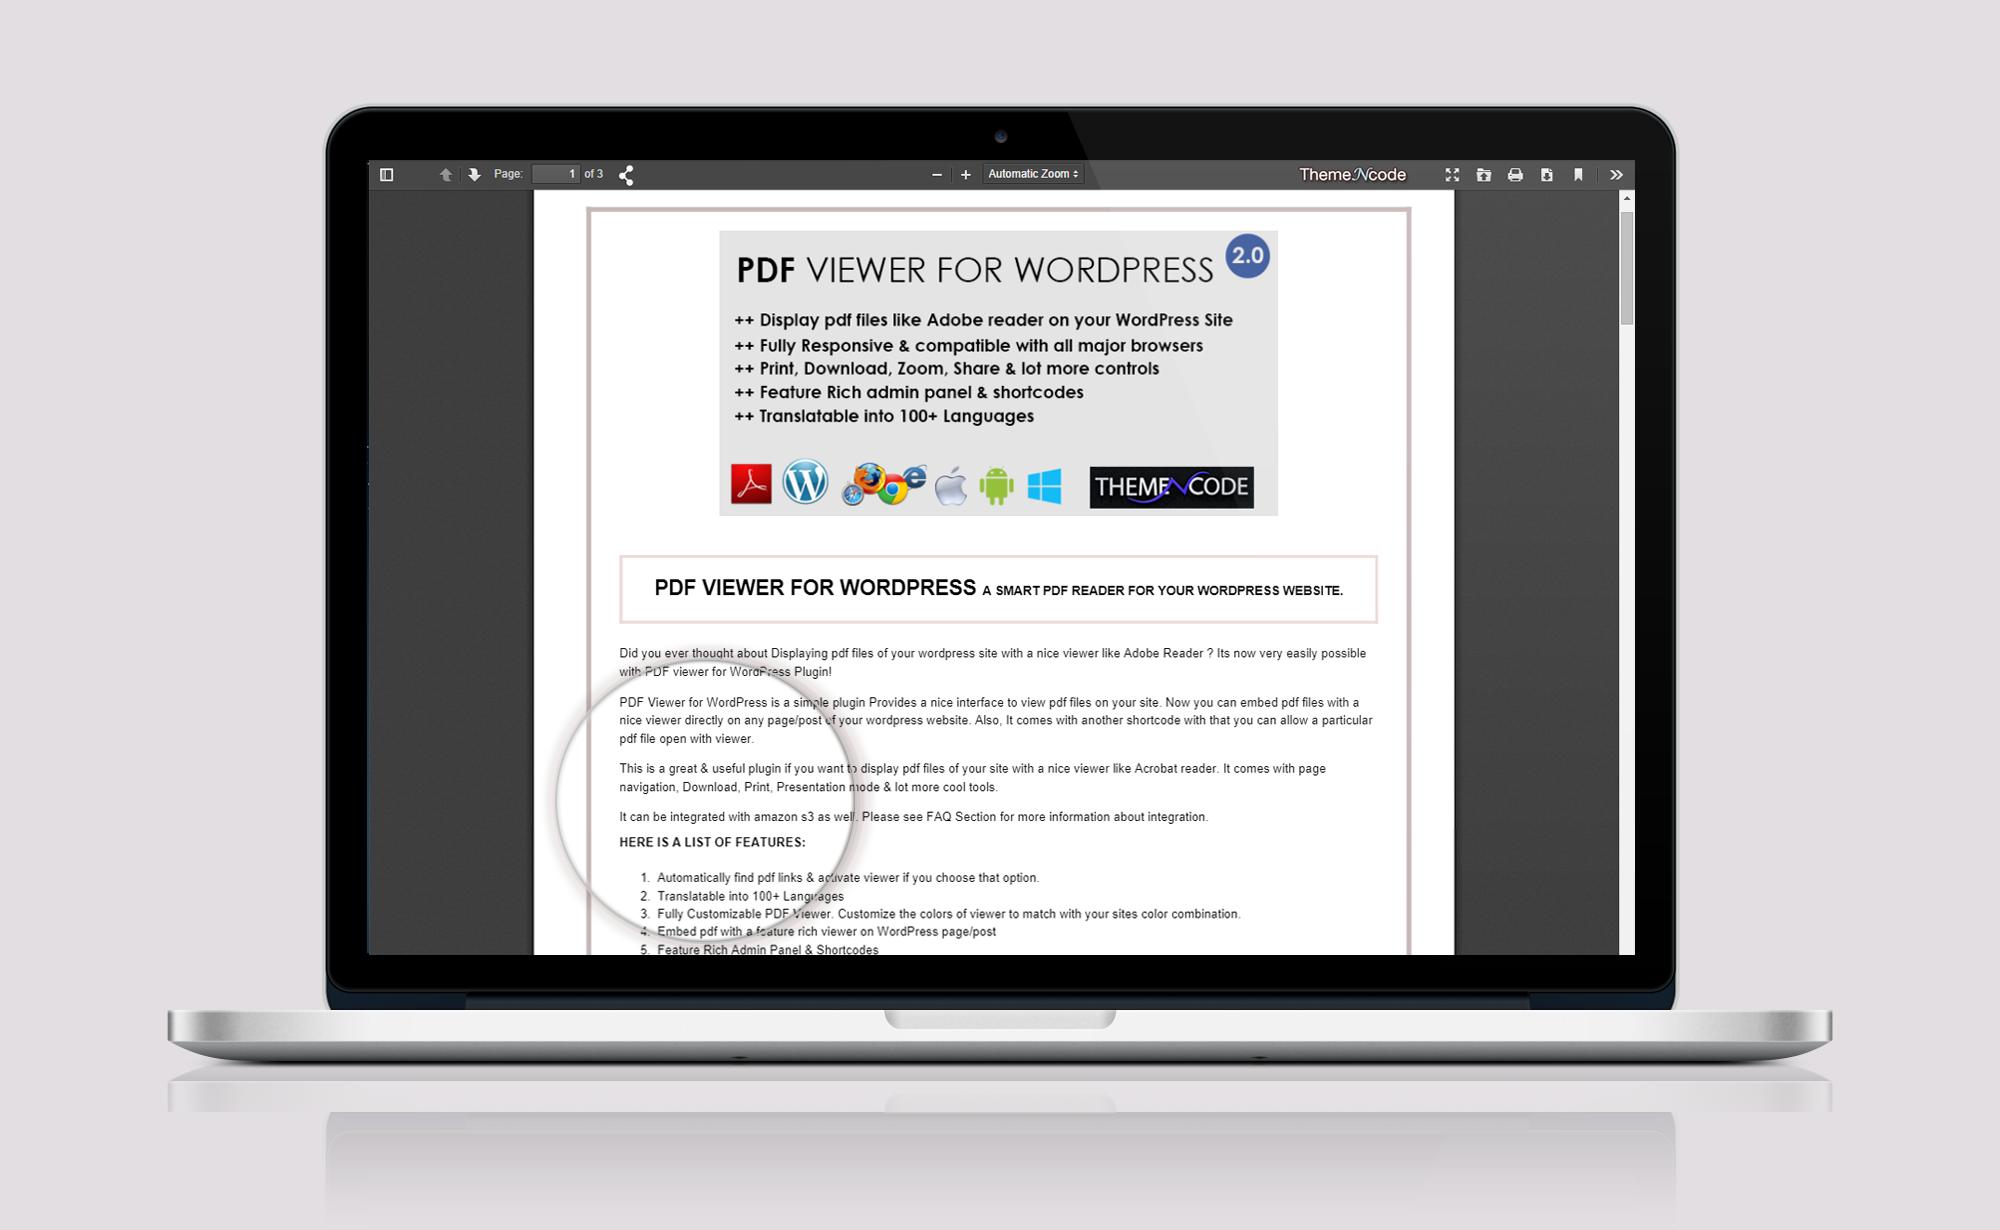 ThemeNcode PDF Reader Full View